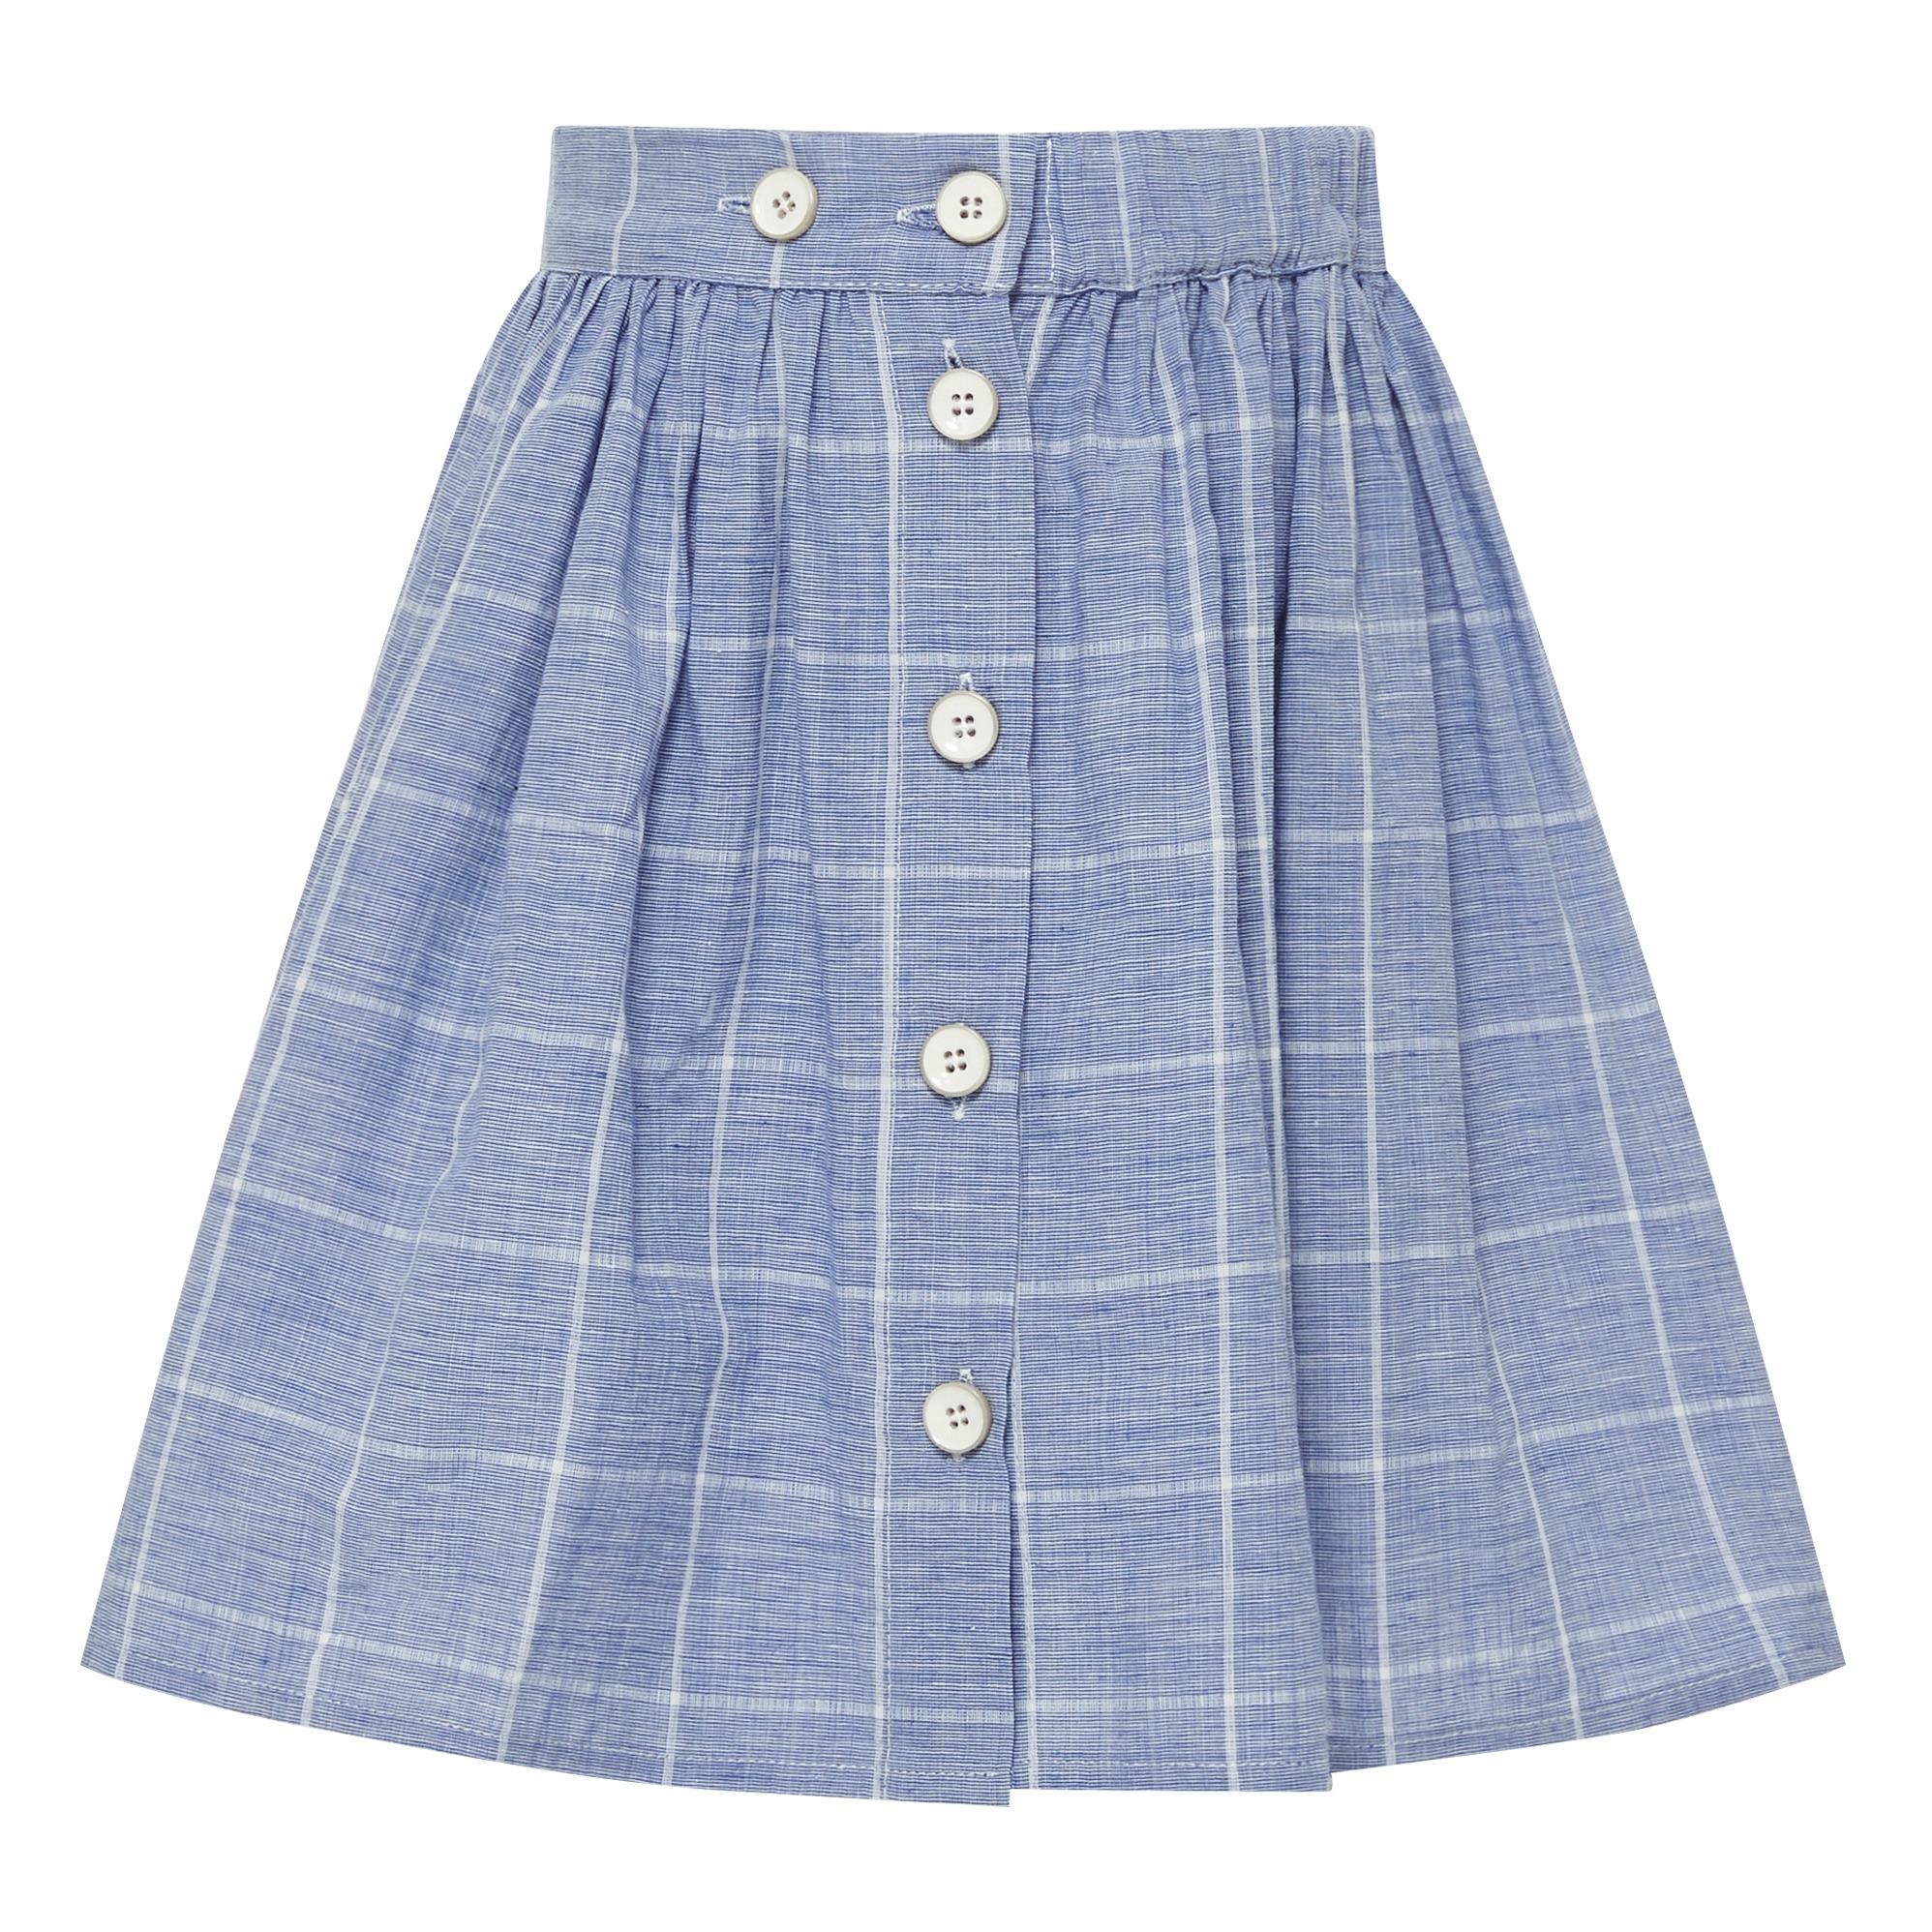 3f18f900a Jo midi skirt Denim blue Morley Fashion Teen , Children. «